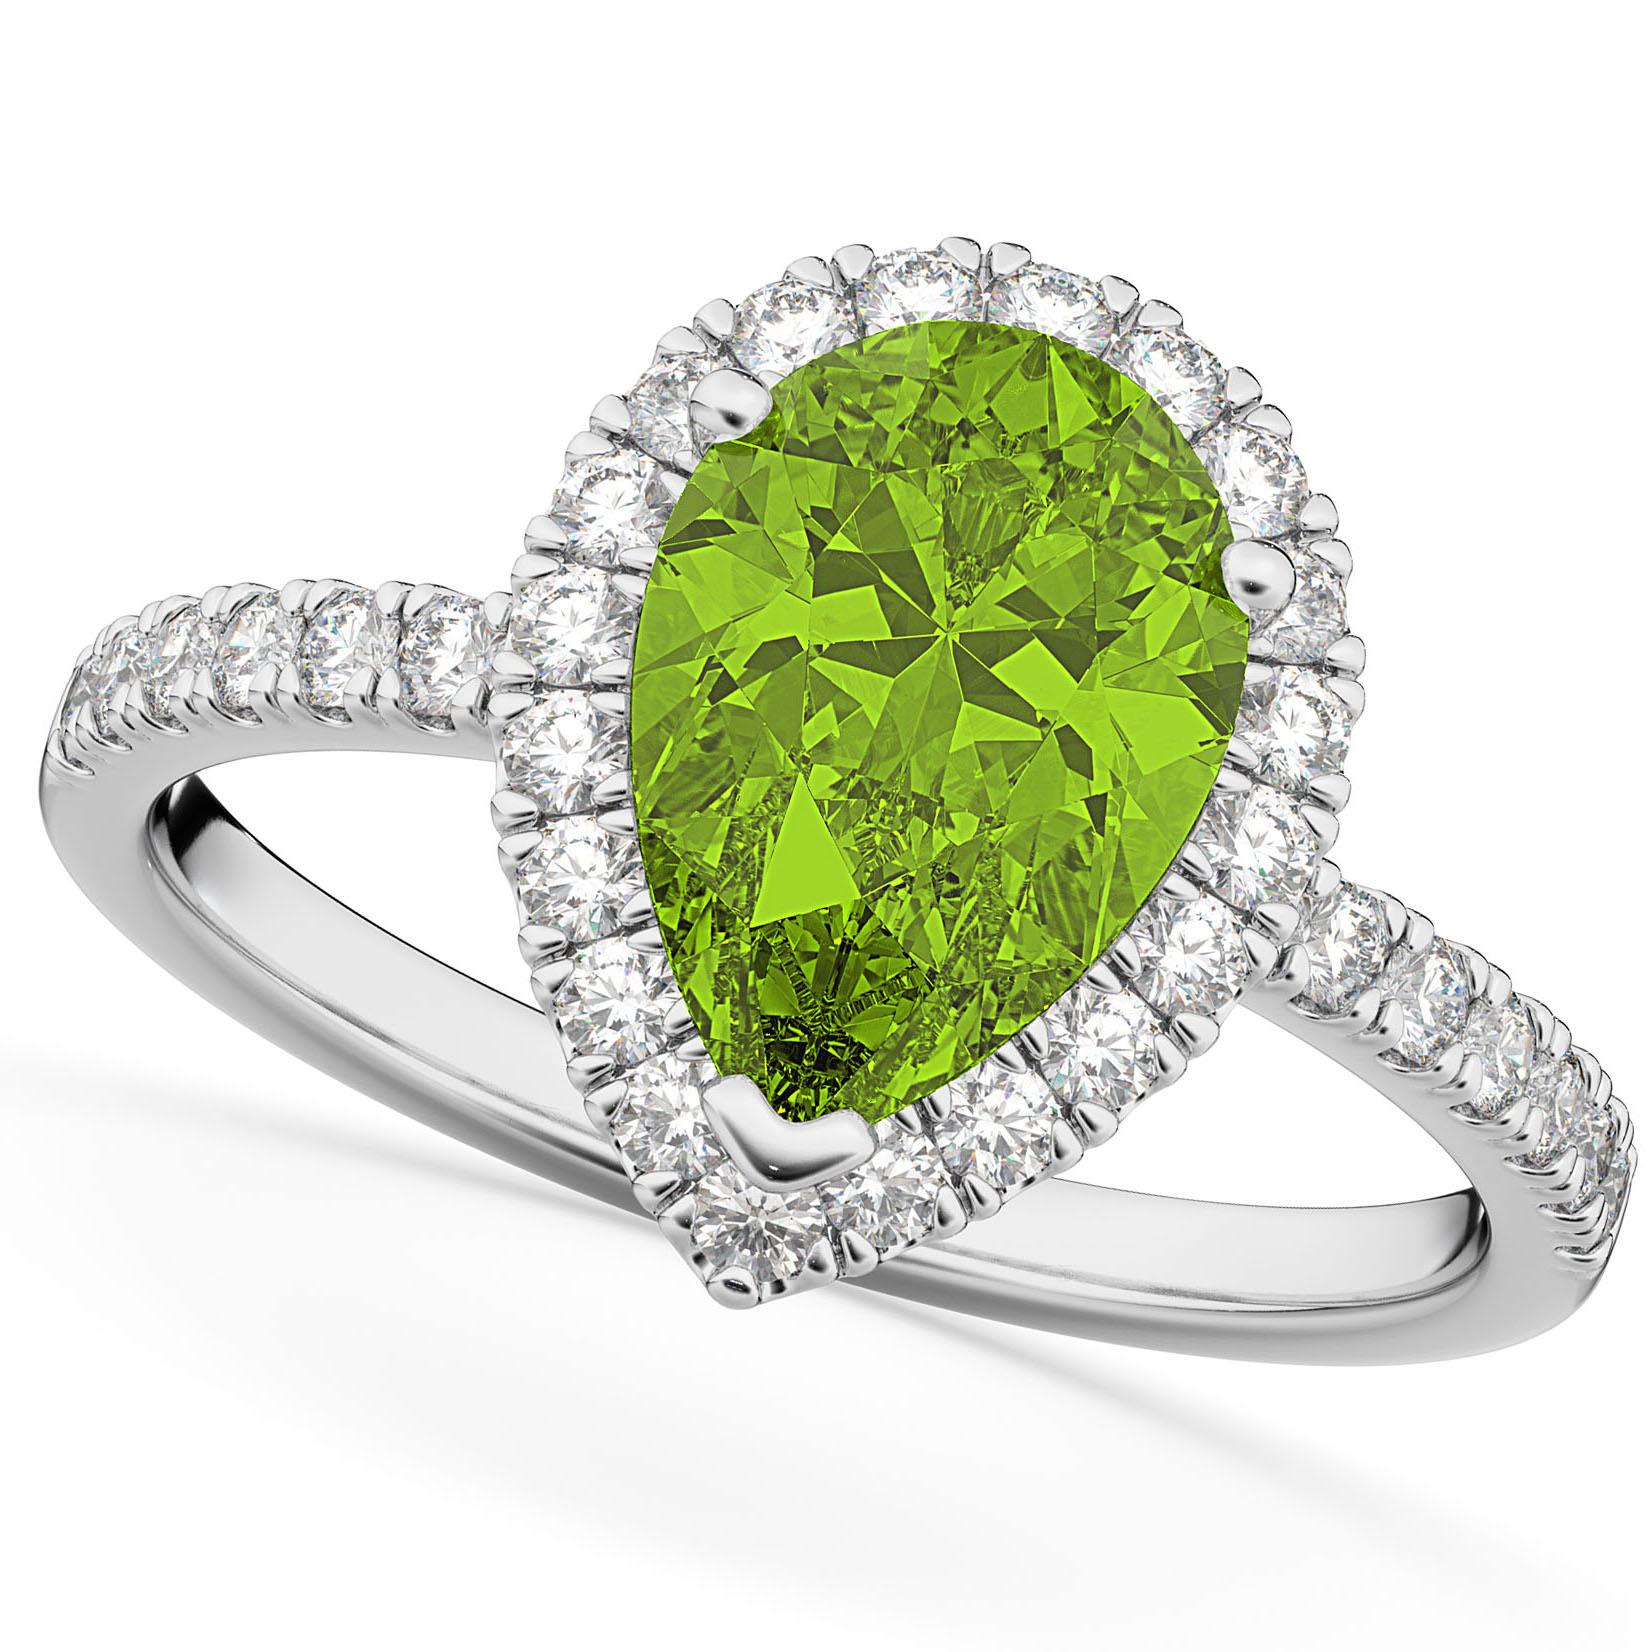 Pear Cut Halo Peridot & Diamond Engagement Ring 14K White Gold 1.91ct